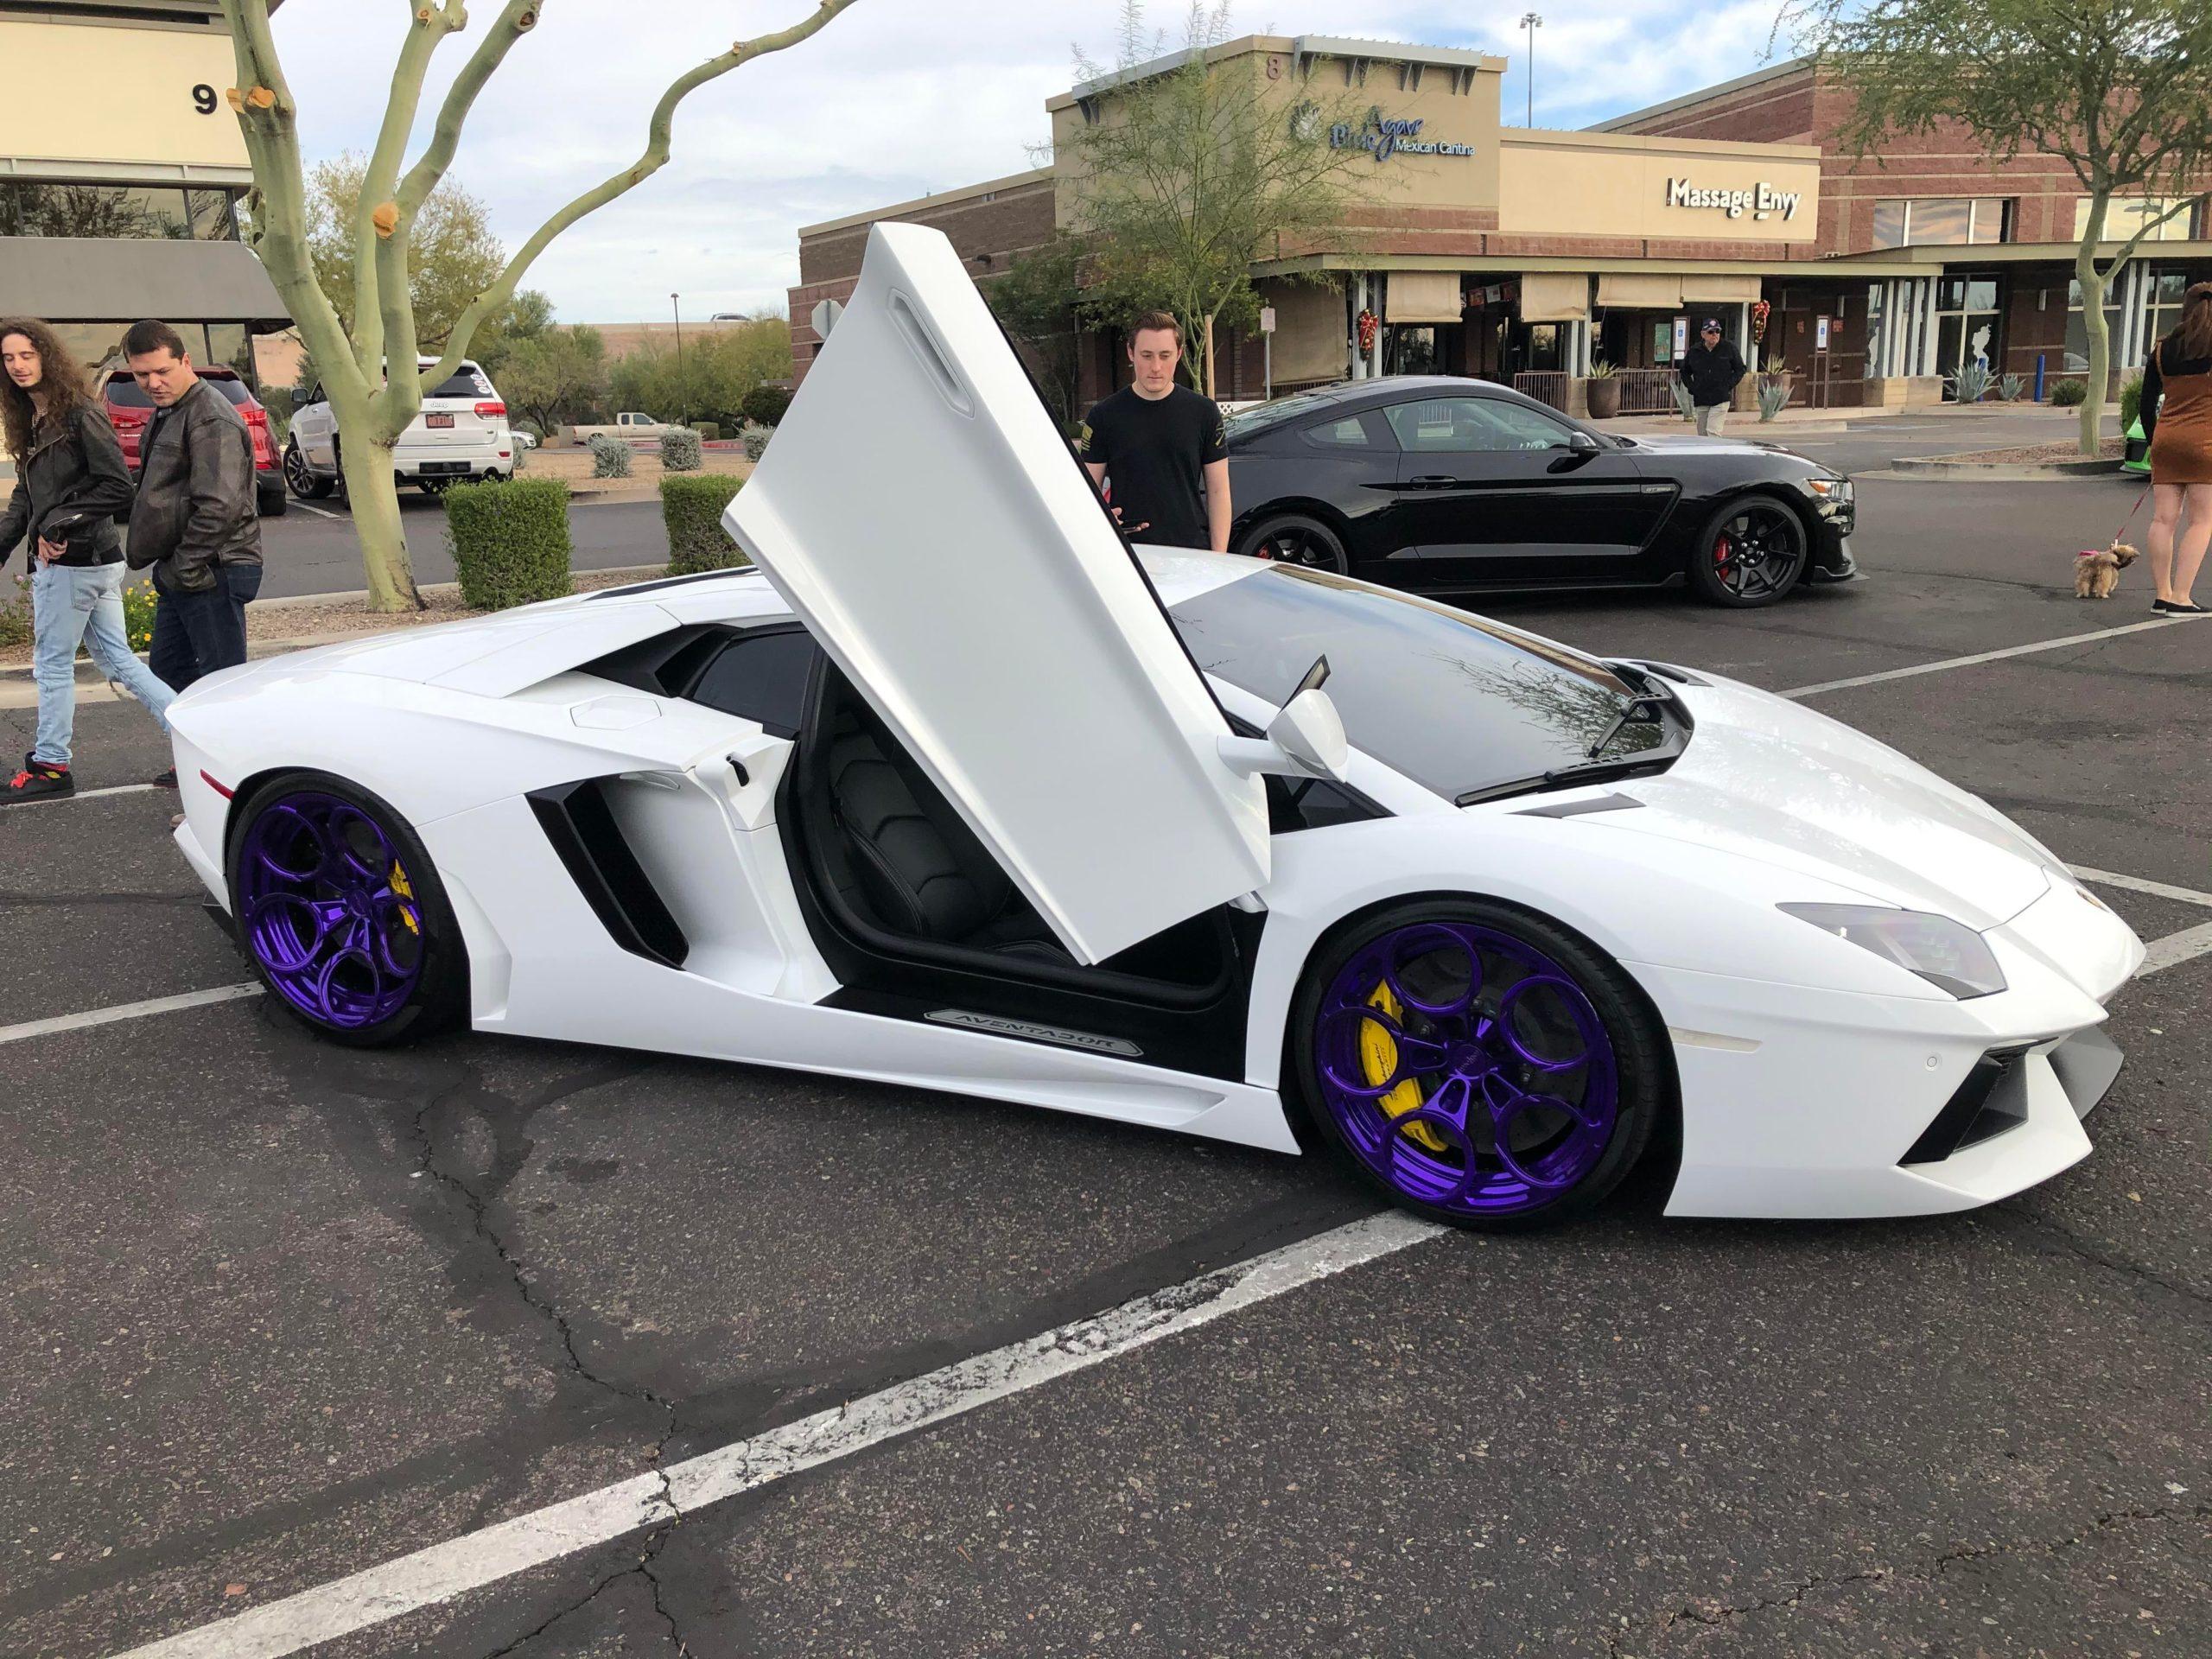 The wheels on this Lamborghini Aventador are stunning